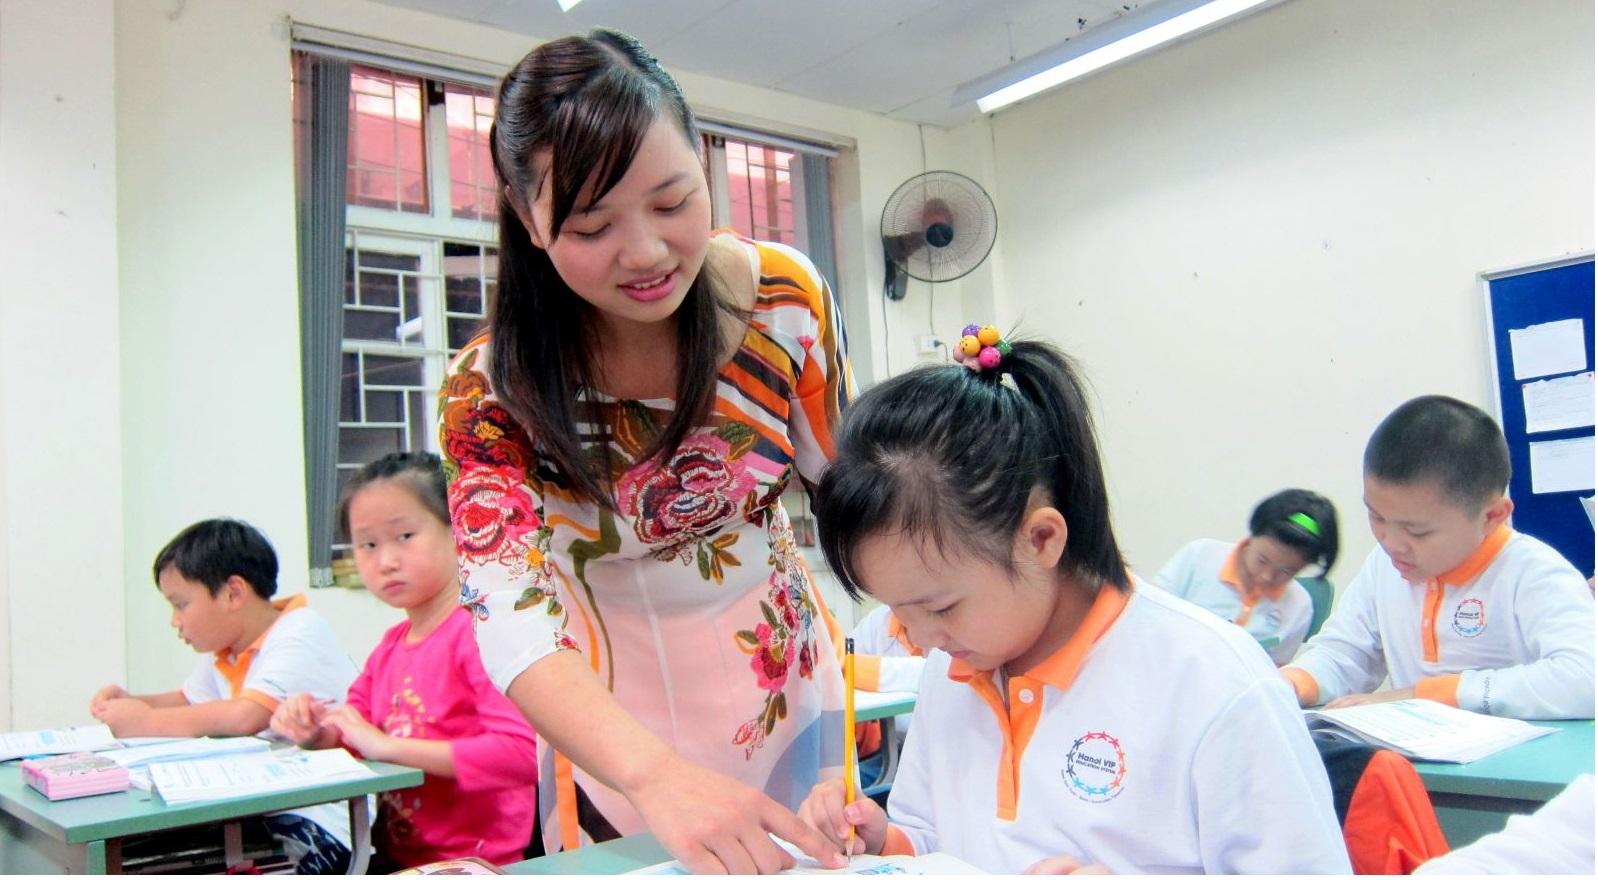 teacher-and-retention-recruitment-crisis